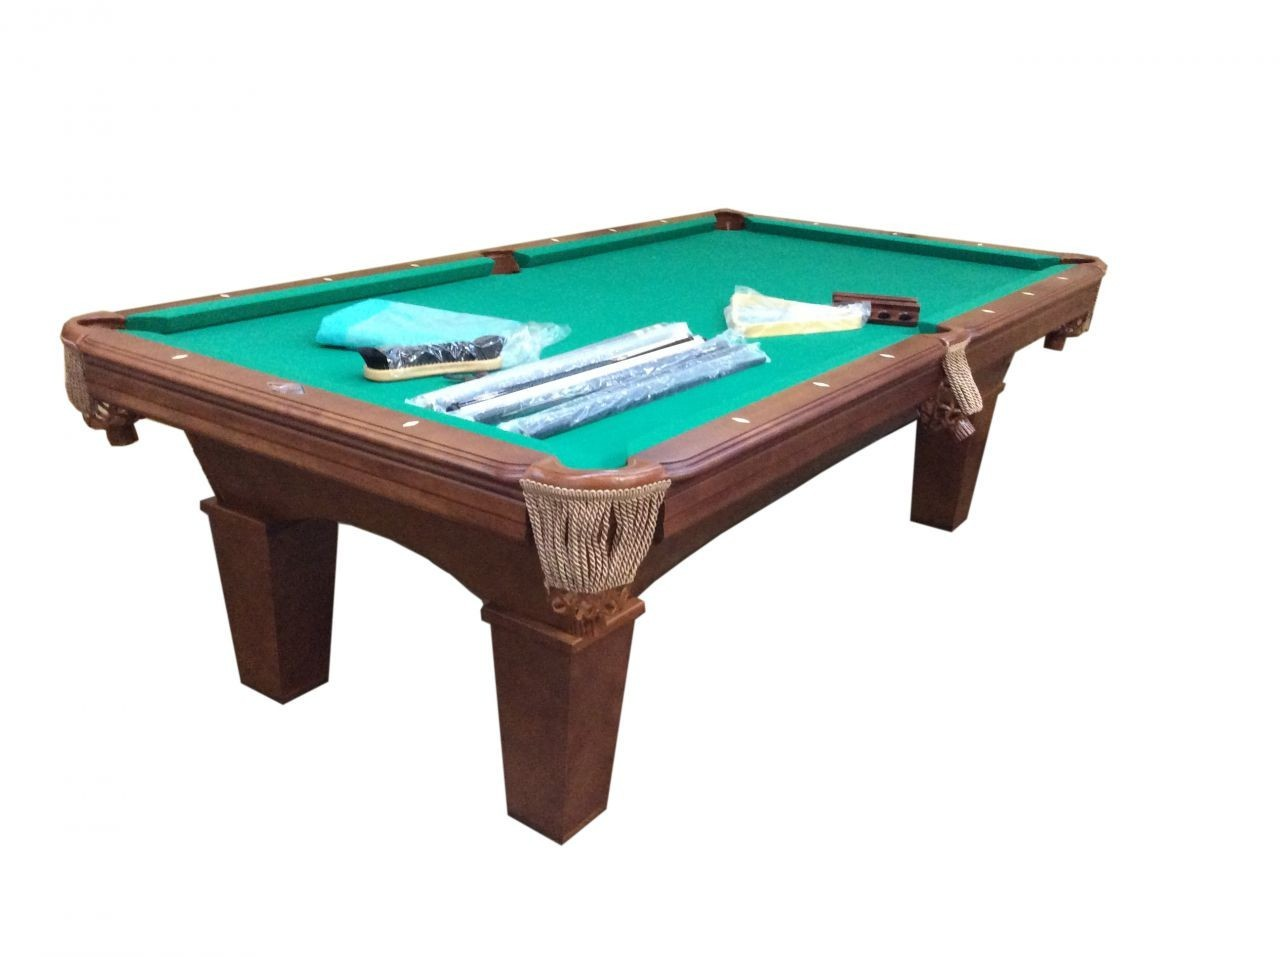 POOL TABLES The HAMILTON - High end pool table